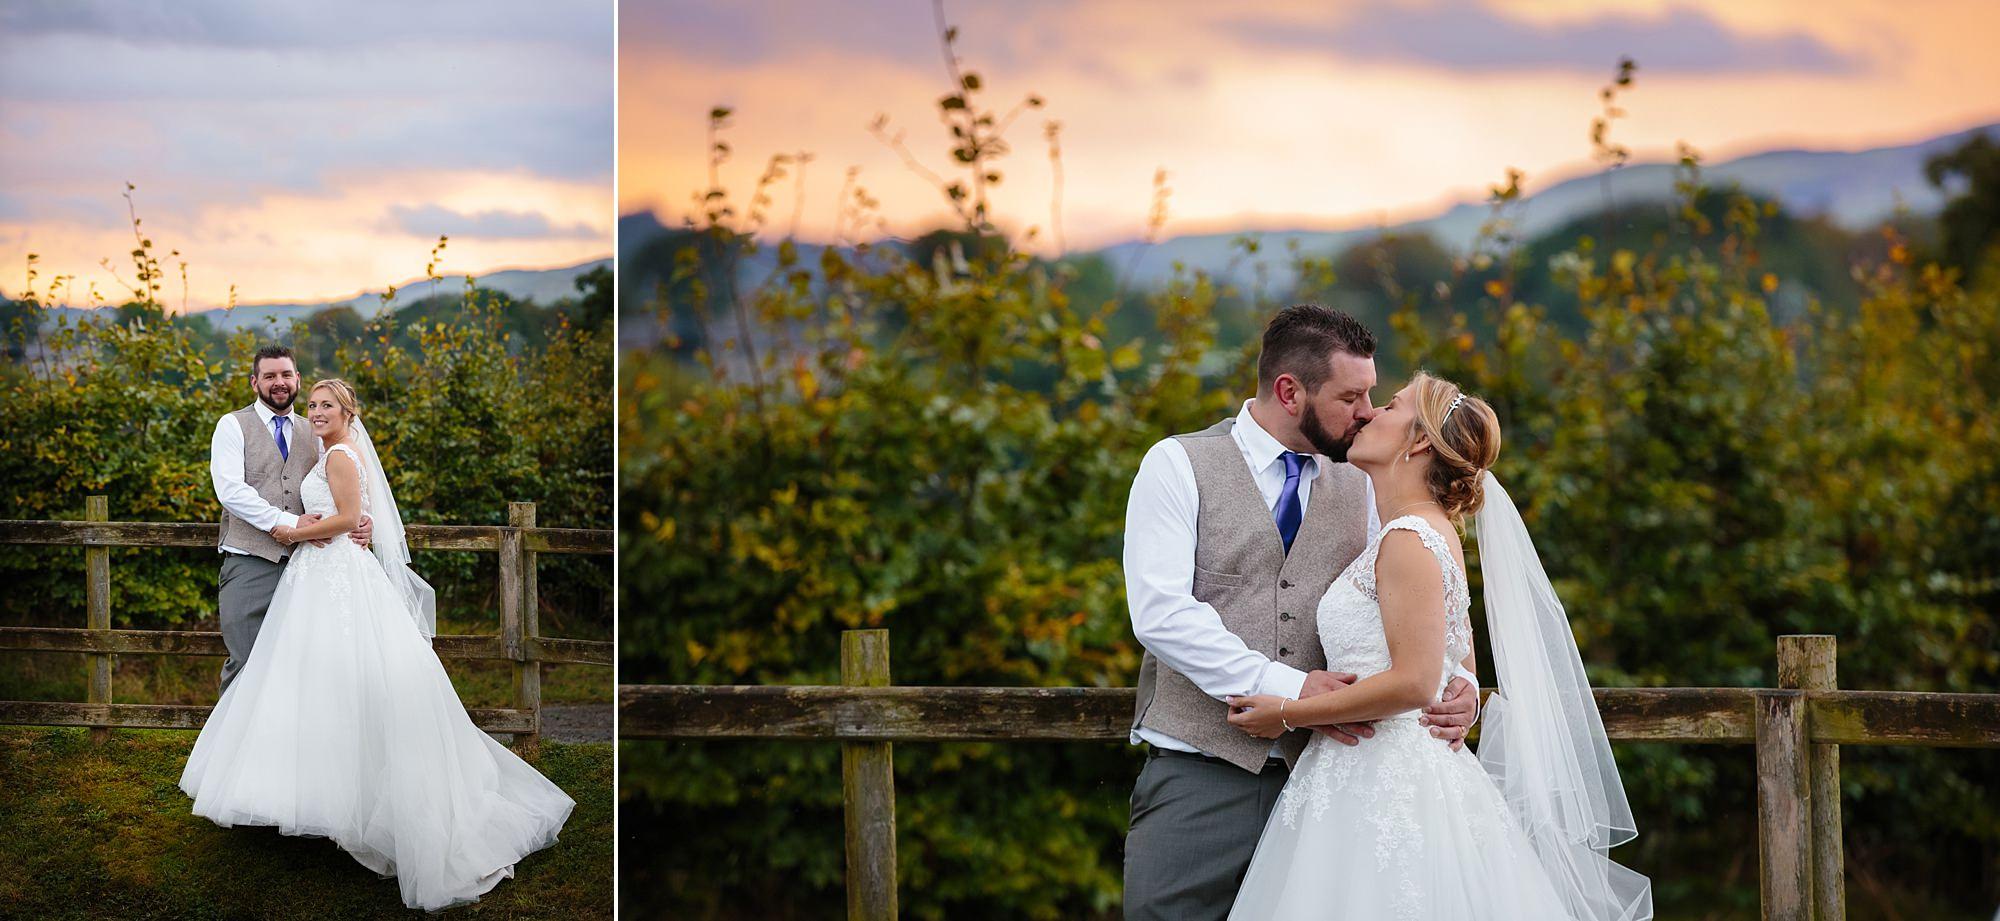 A fun wedding sunset portraits at Plas Isaf